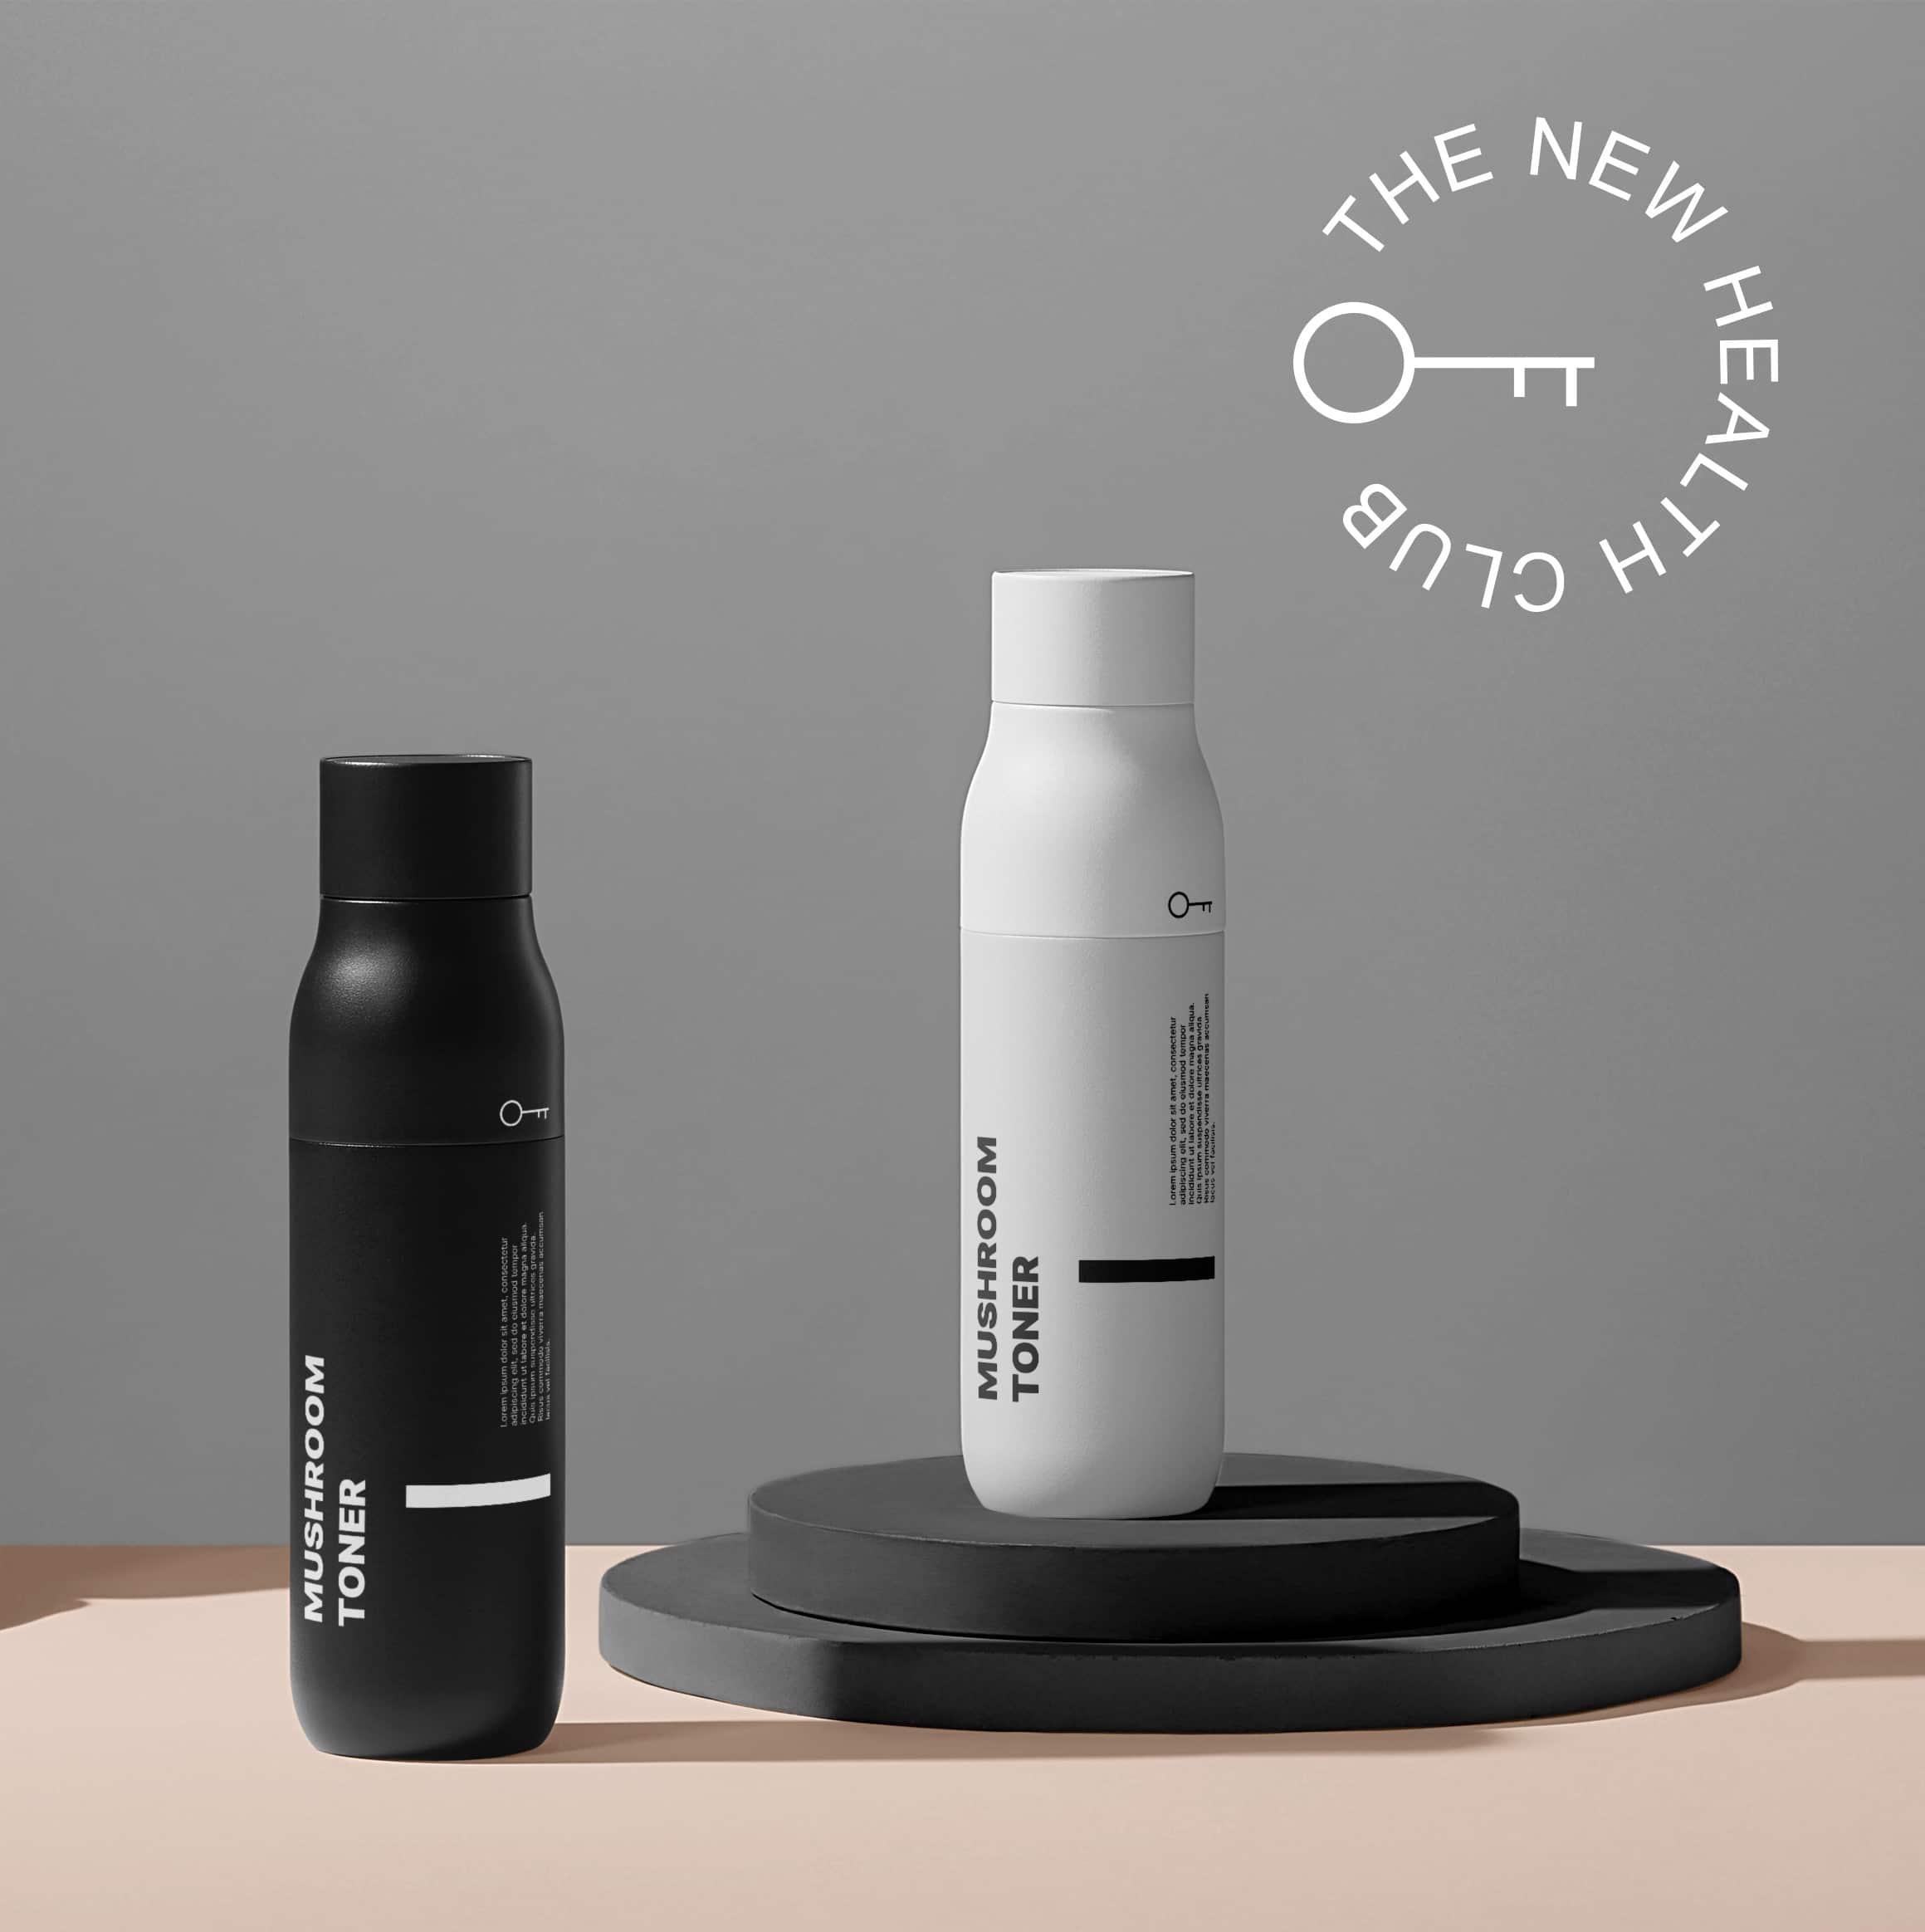 mimosa - brand consultancy - digital marketing agency - creative studio - Glass bottle - Product design